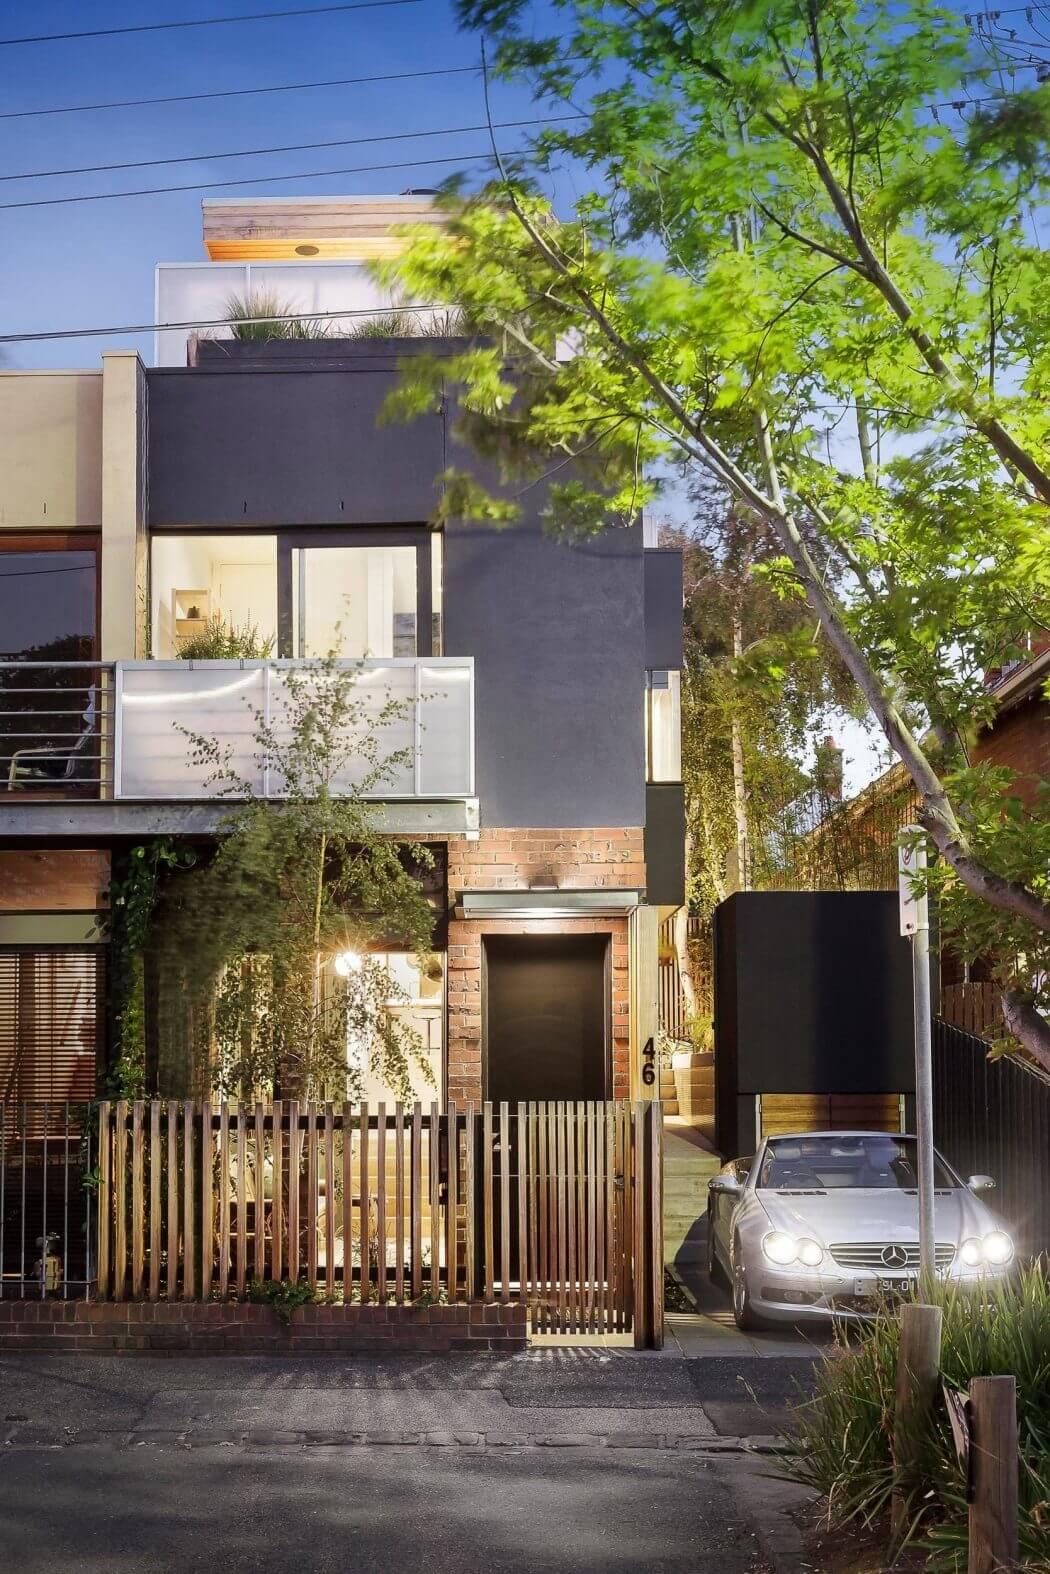 013-windsor-residence-urban-angles-1050x1574